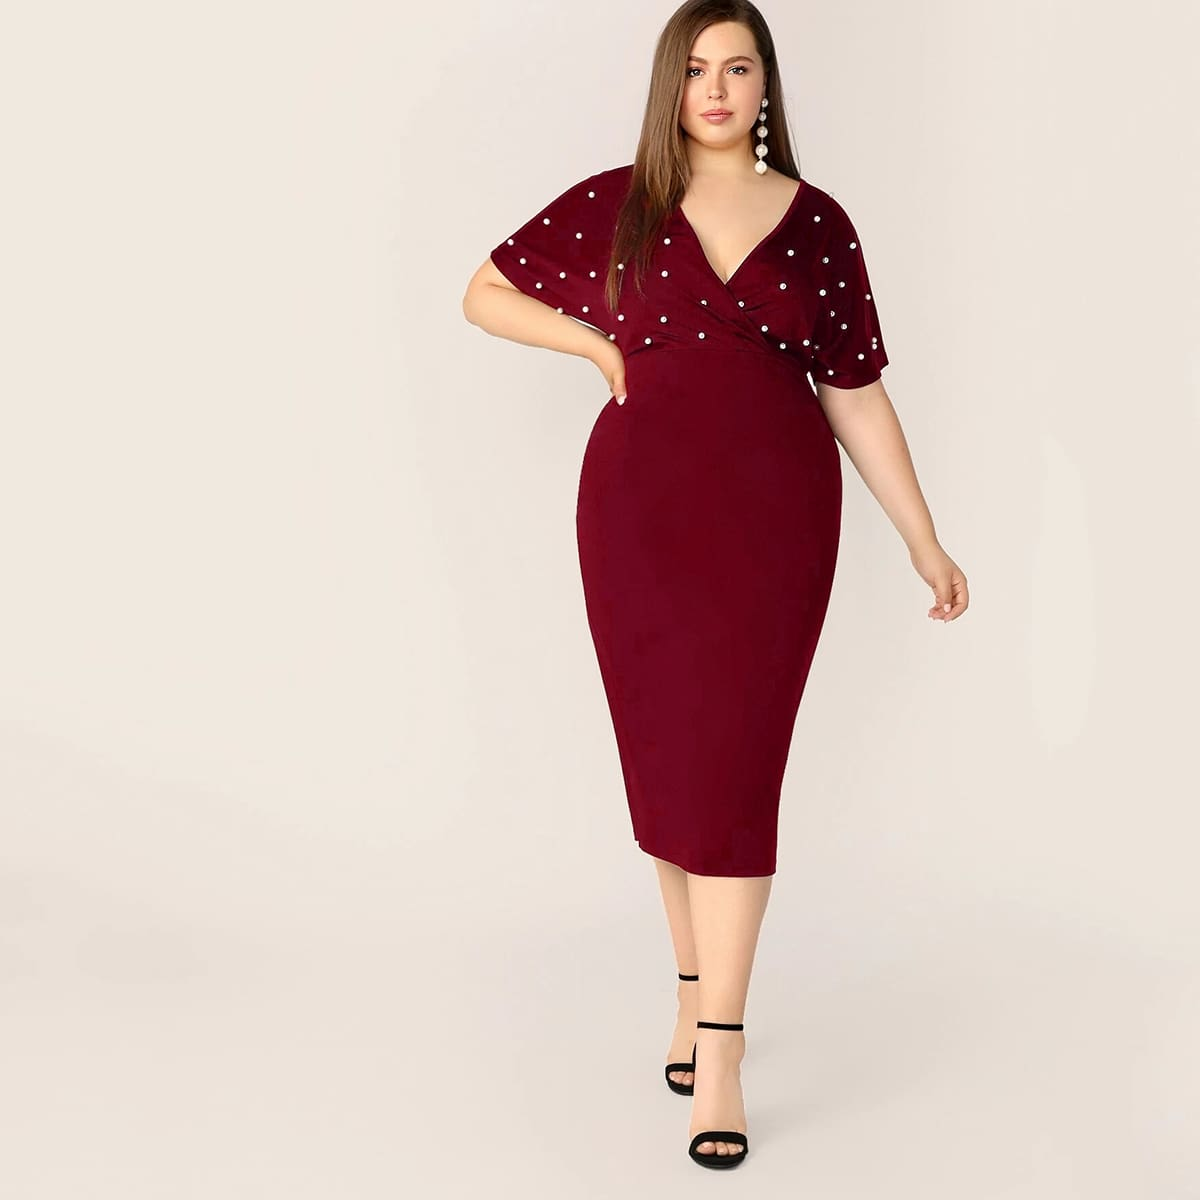 Bordeaux Elegant Vlak Grote maten jurken Kralen